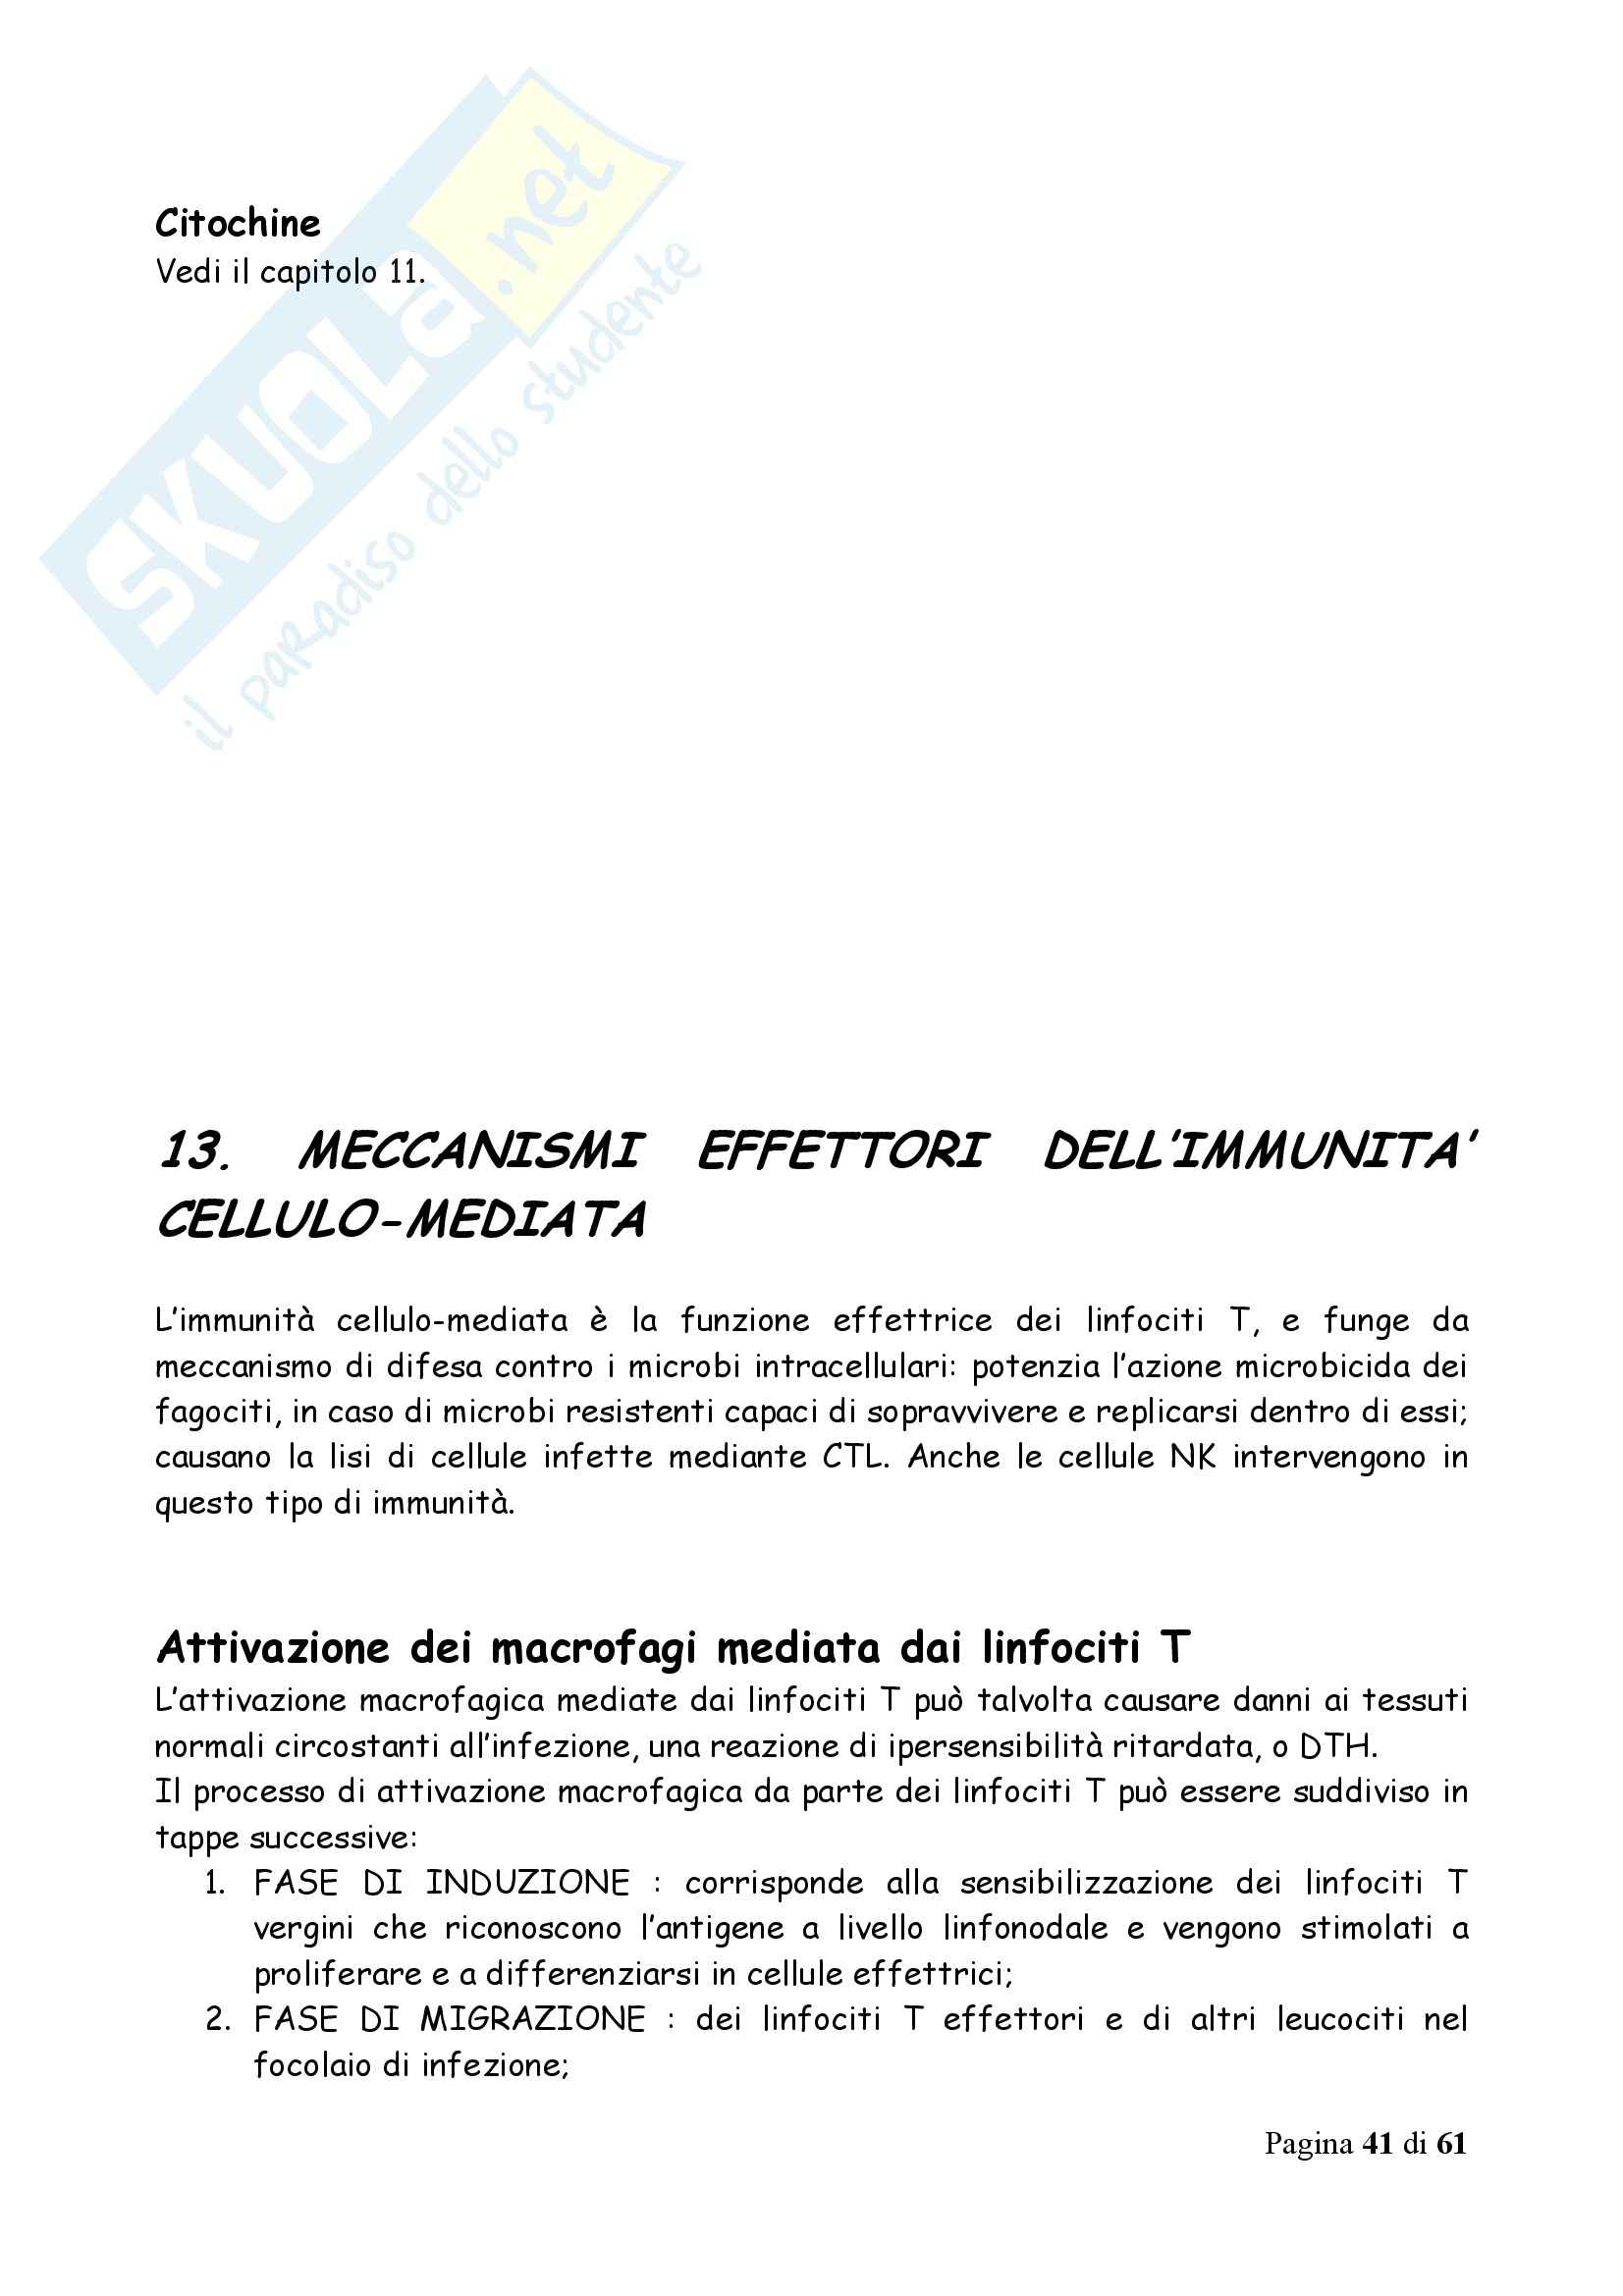 Immunologia - Appunti Pag. 41